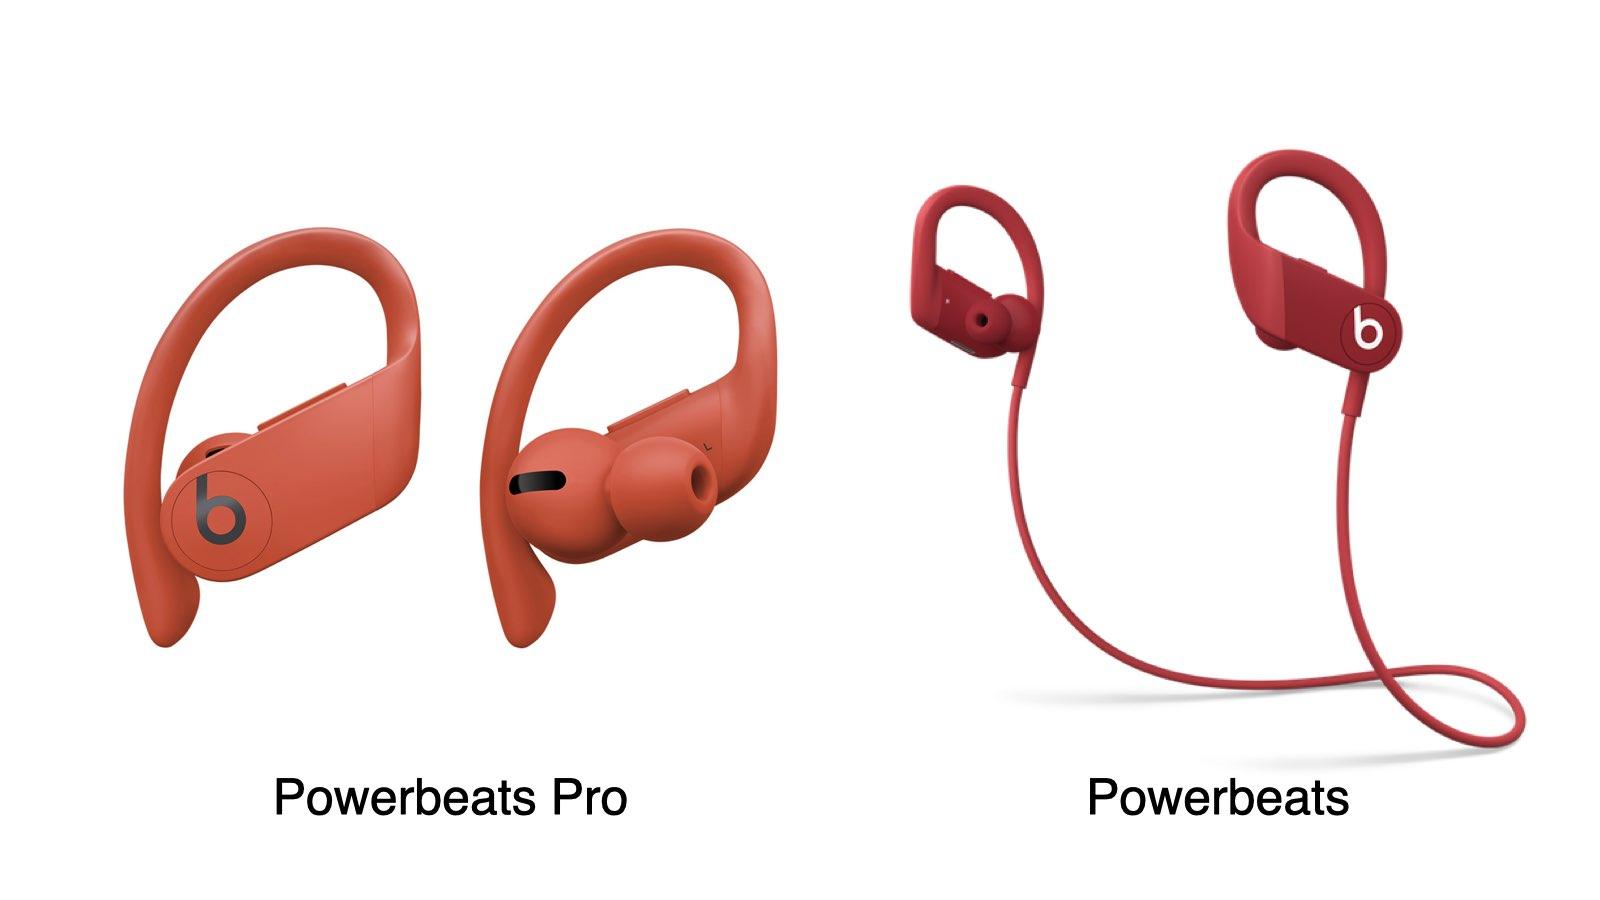 PowerbeatsPro 和 Powerbeats